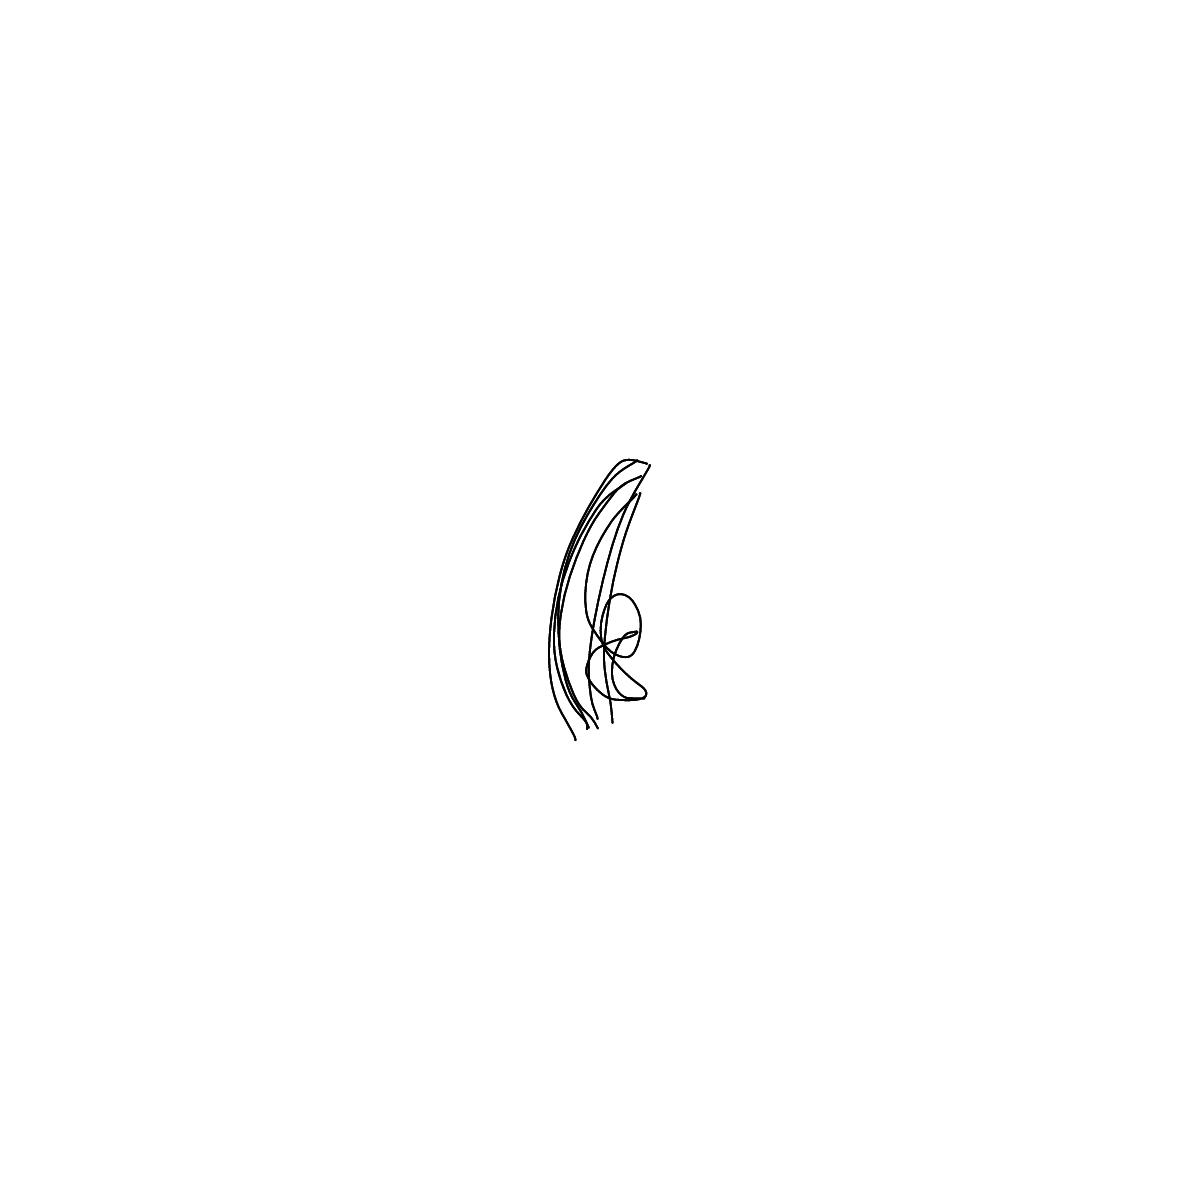 BAAAM drawing#18234 lat:56.5727119445800800lng: 25.4576034545898440